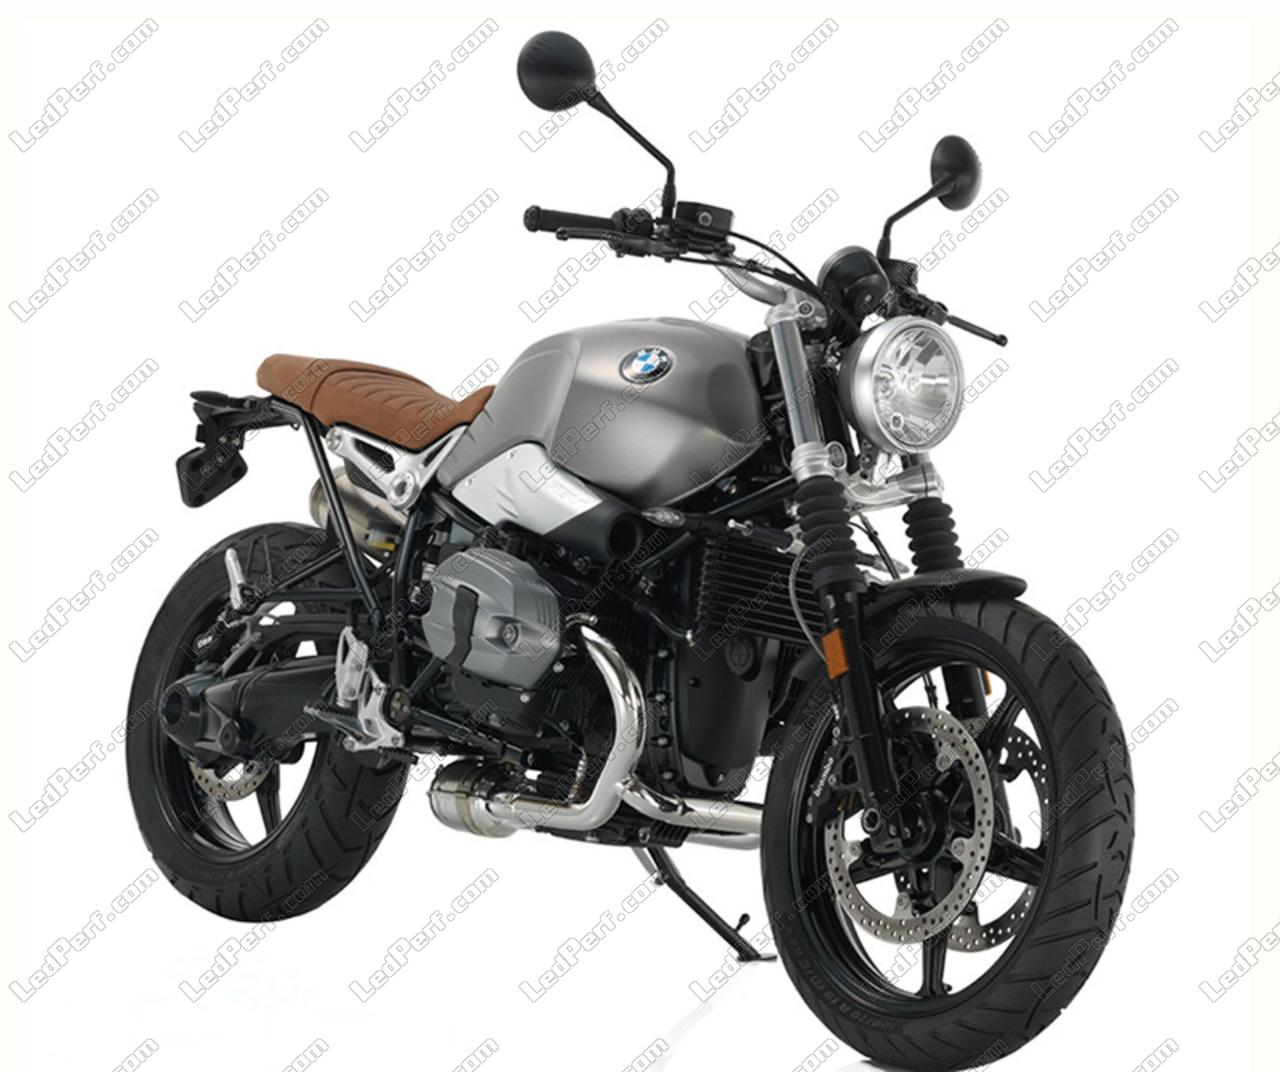 LED headlight for BMW Motorrad R Nine T Scrambler - Round motorcycle optics  approved